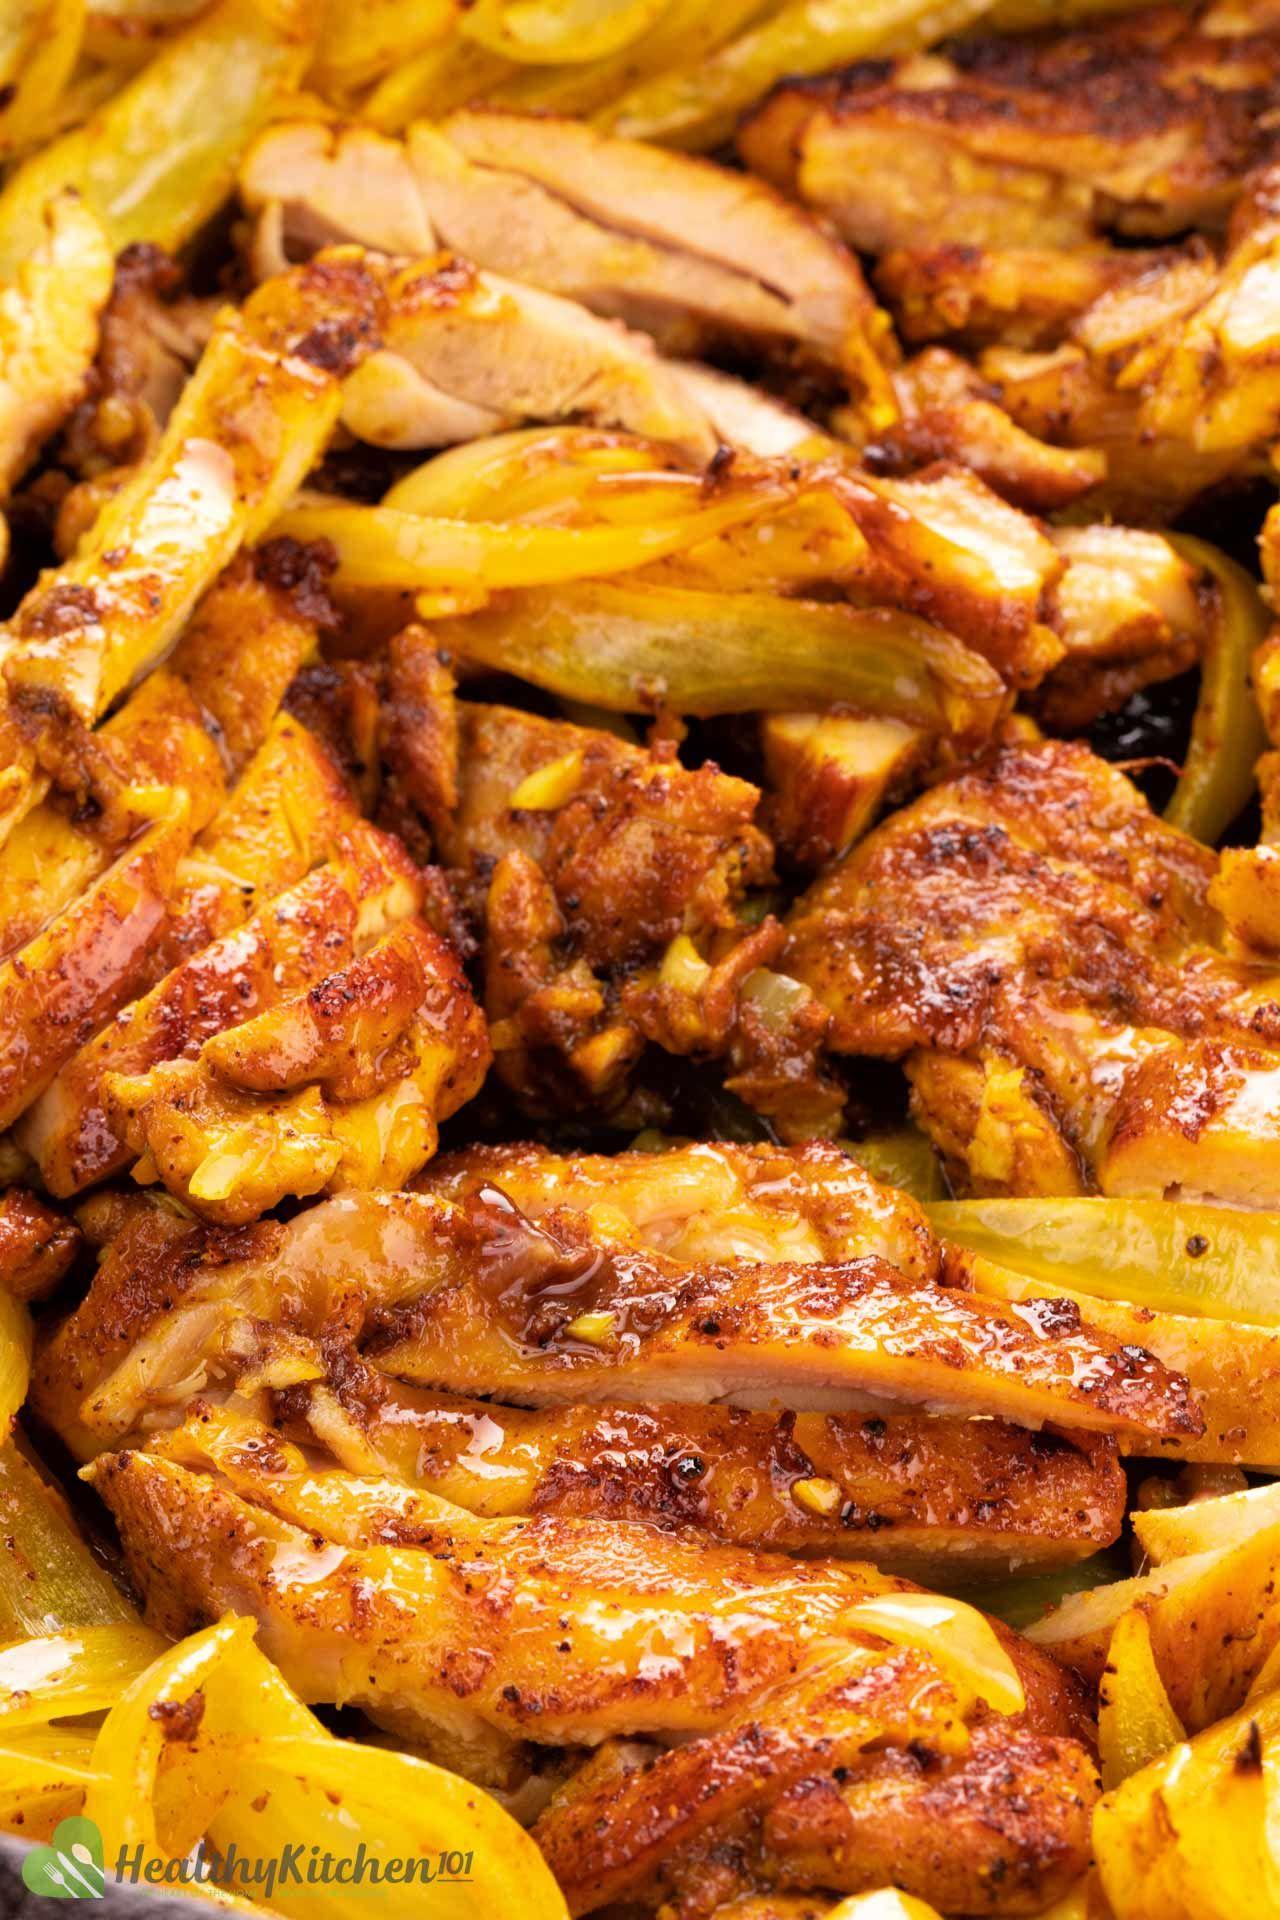 Homemade chicken Shawarma recipe